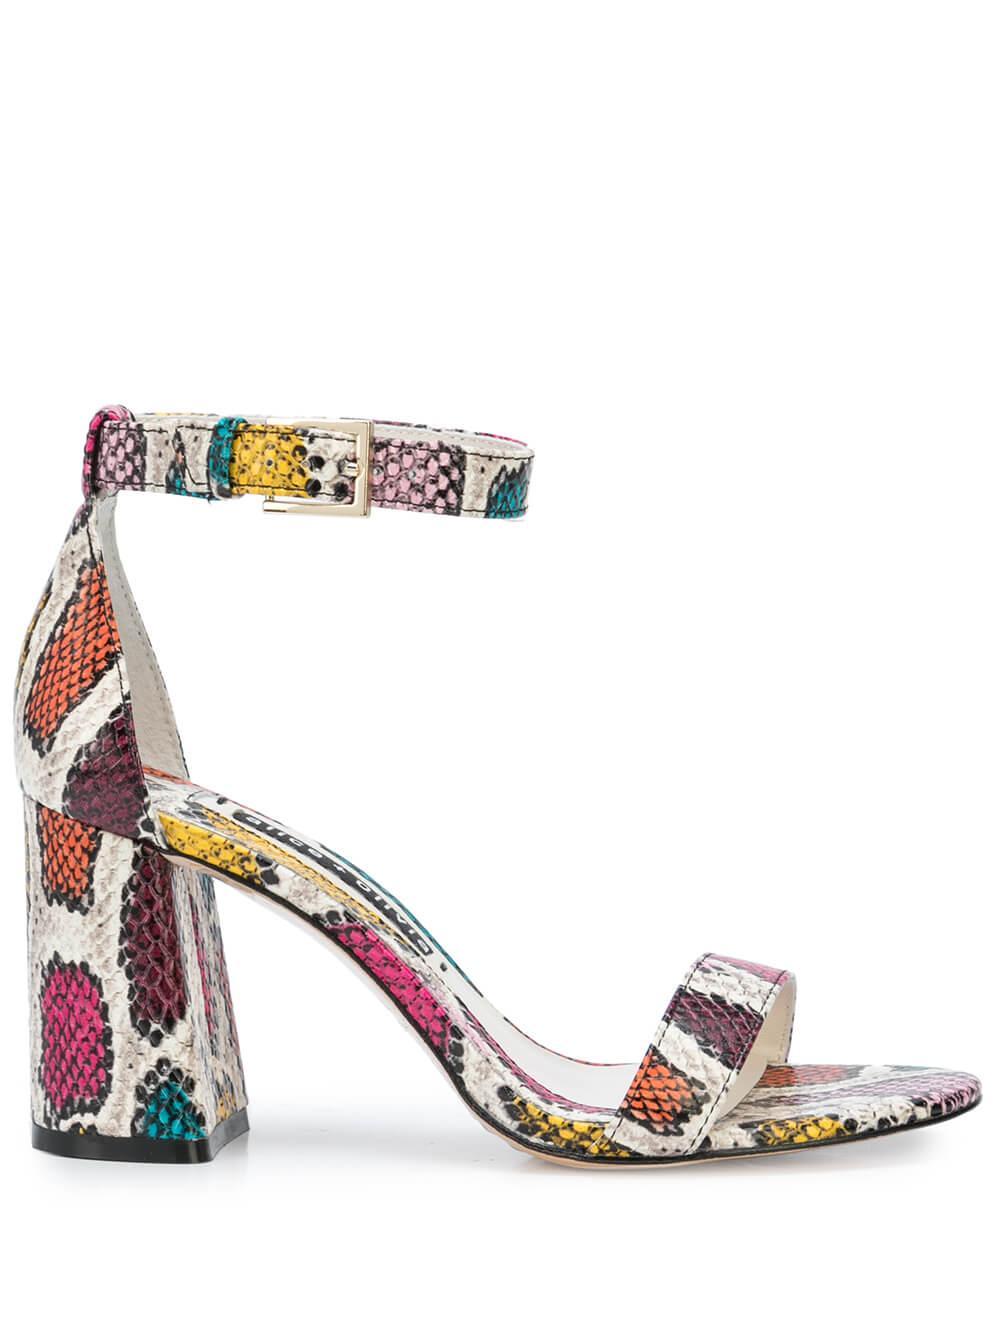 Snake Print Block Heel Sandal Item # LILLIAN-M